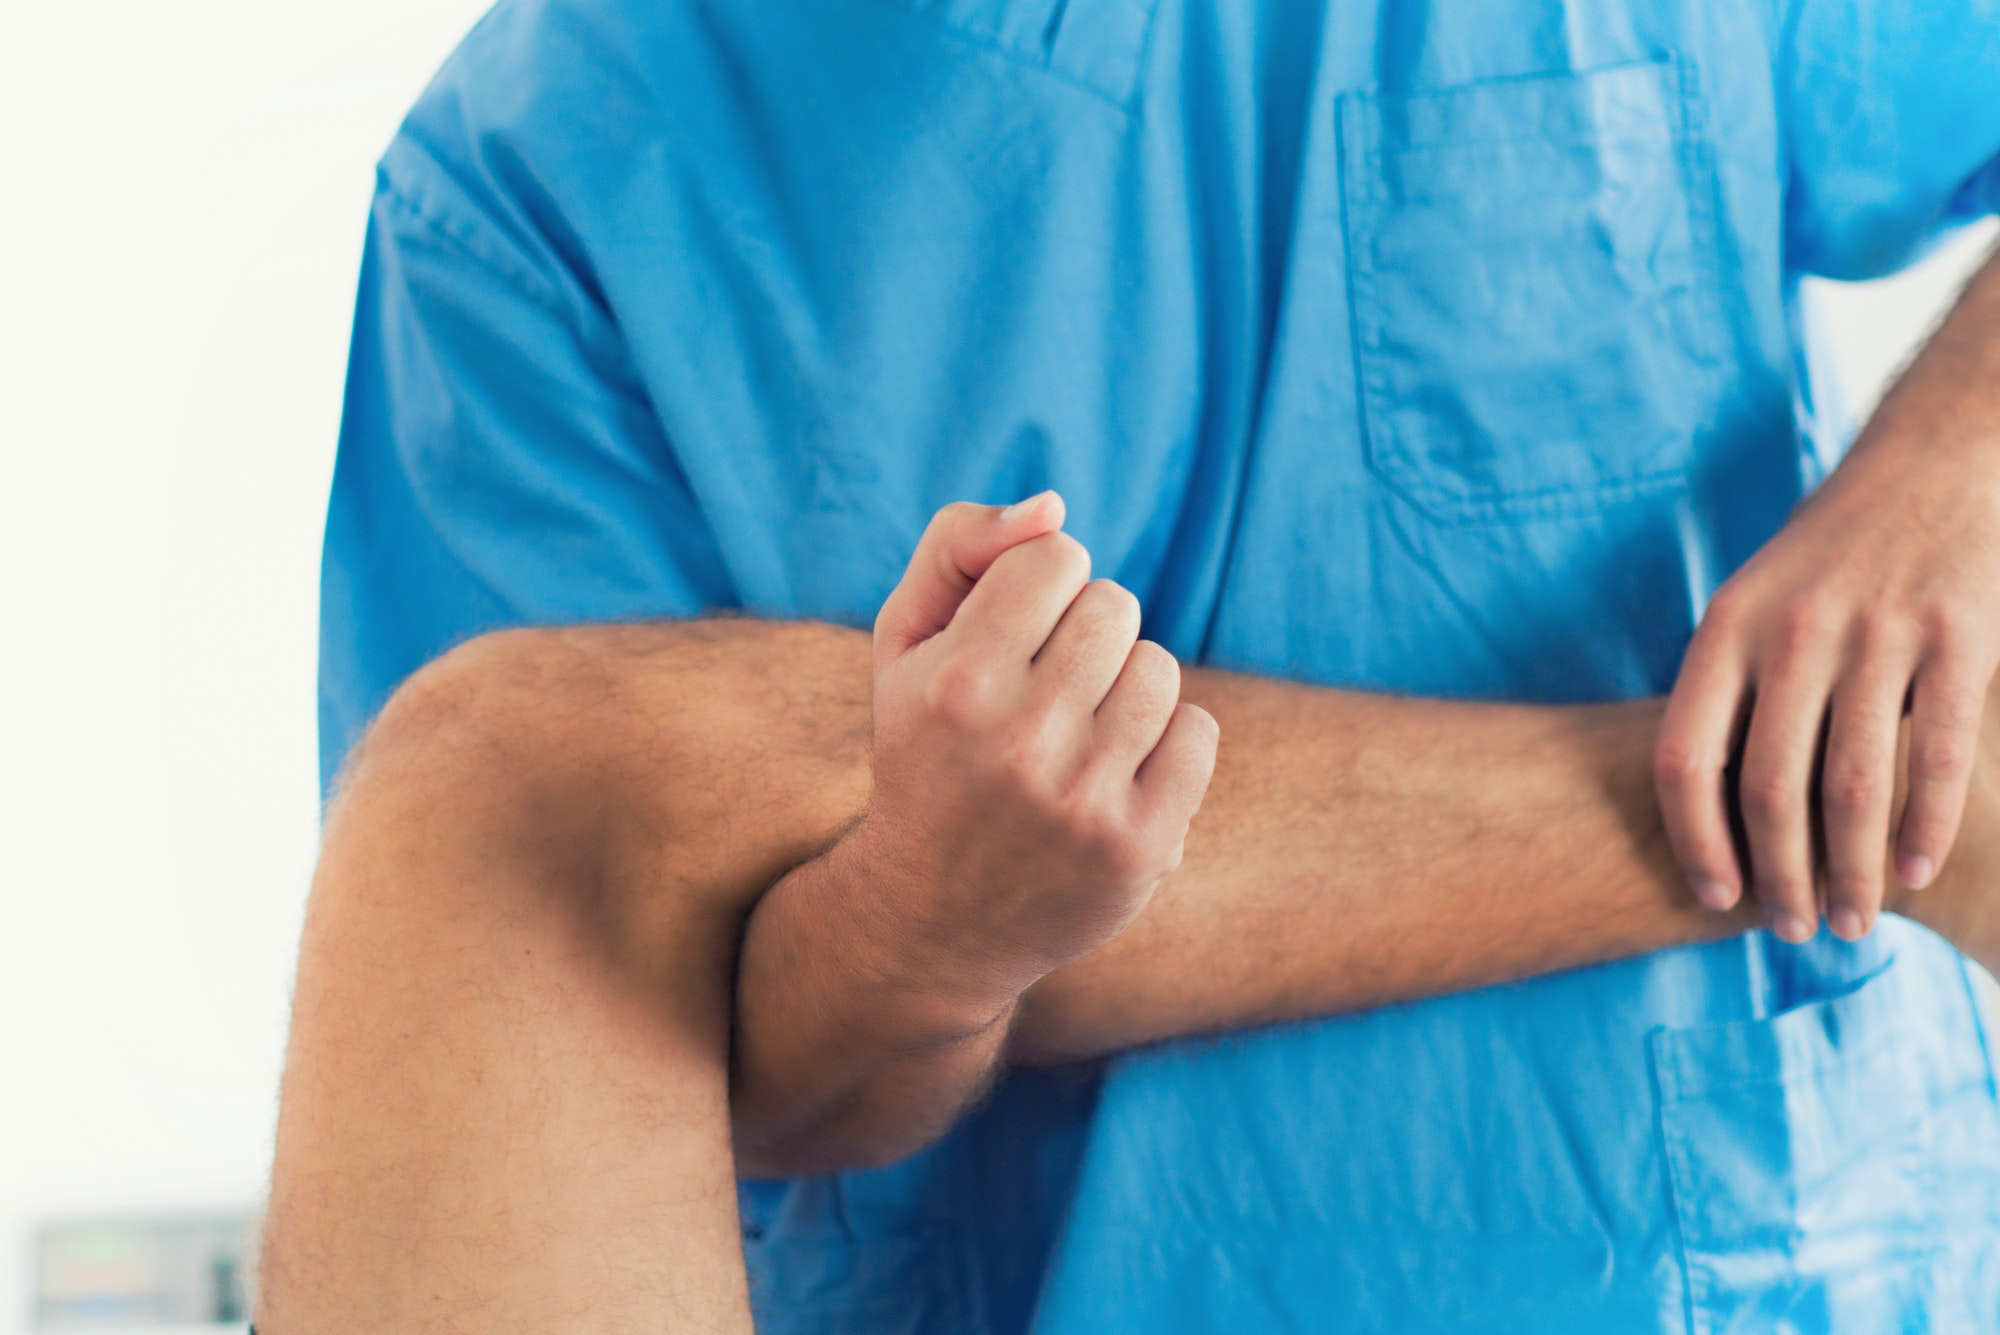 Chiropractic leg adjustment